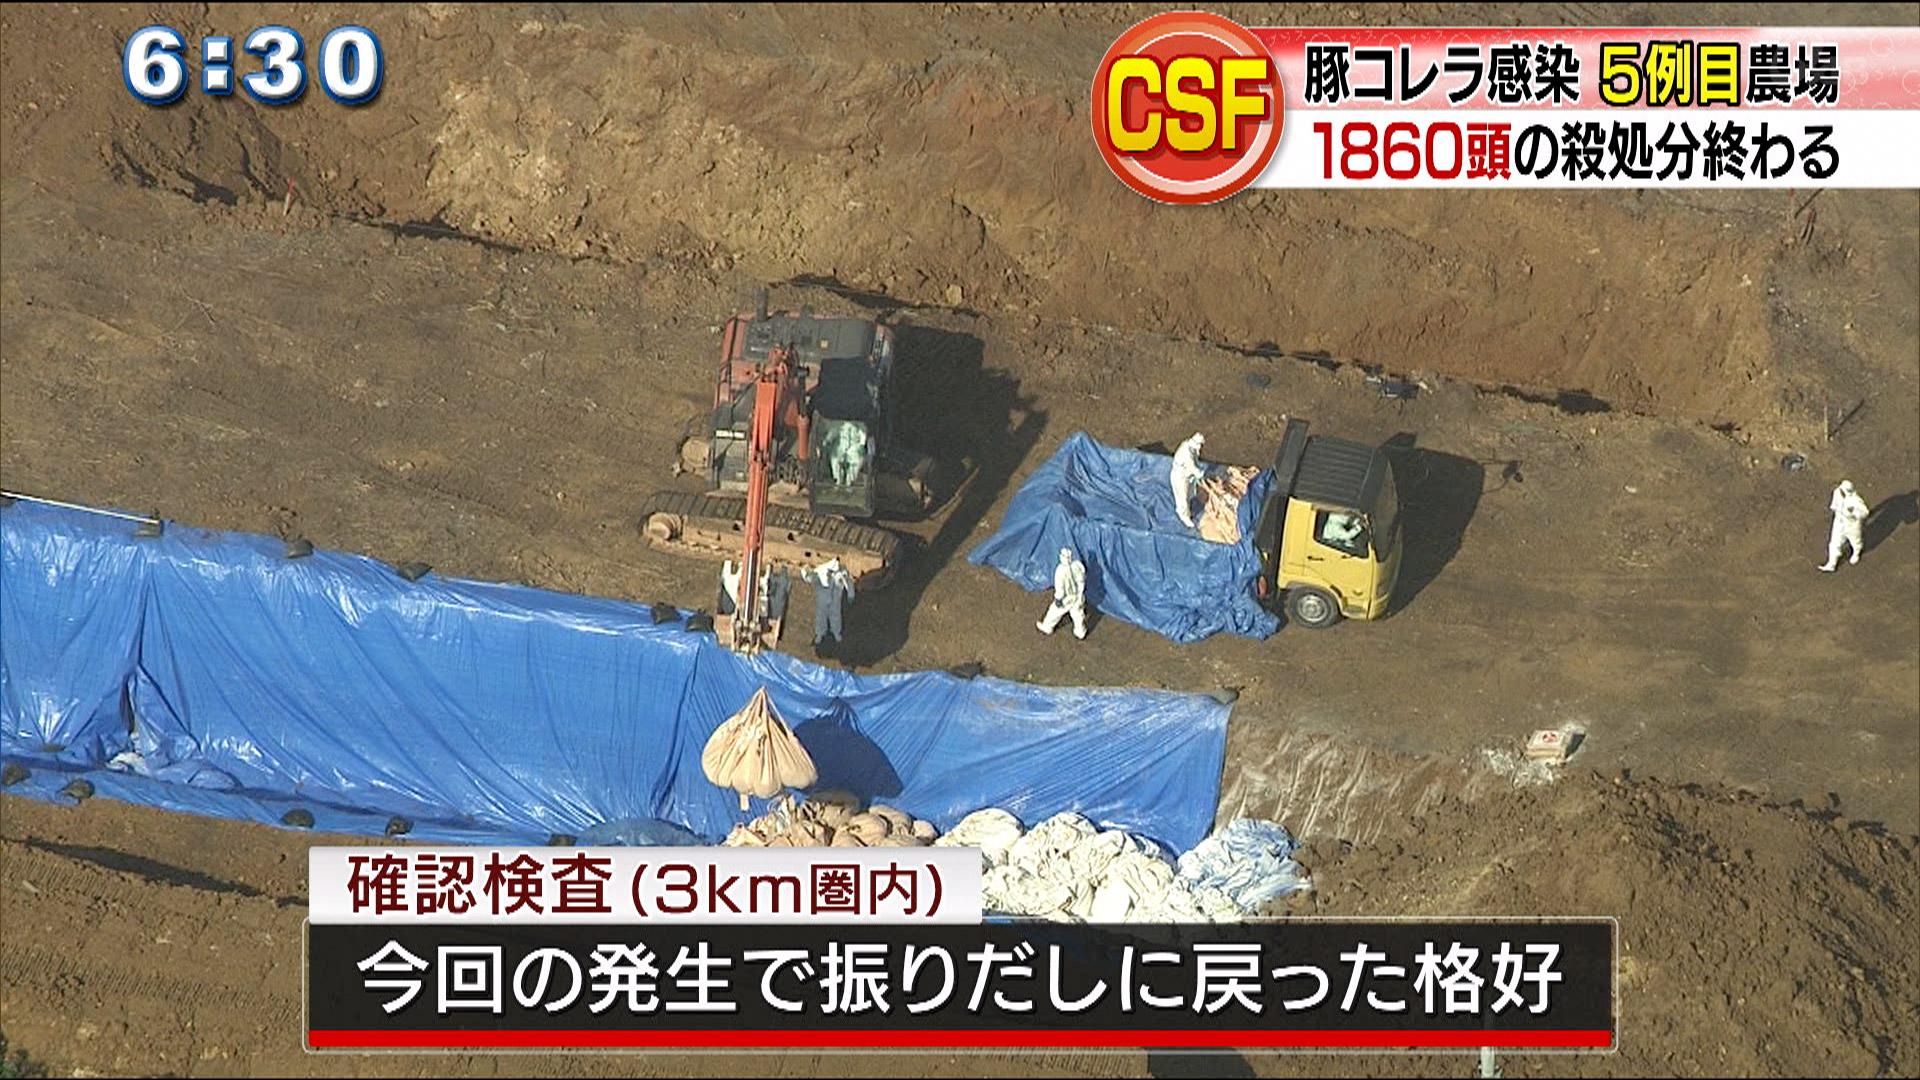 CSF豚コレラ 5例目農場殺処分終わる